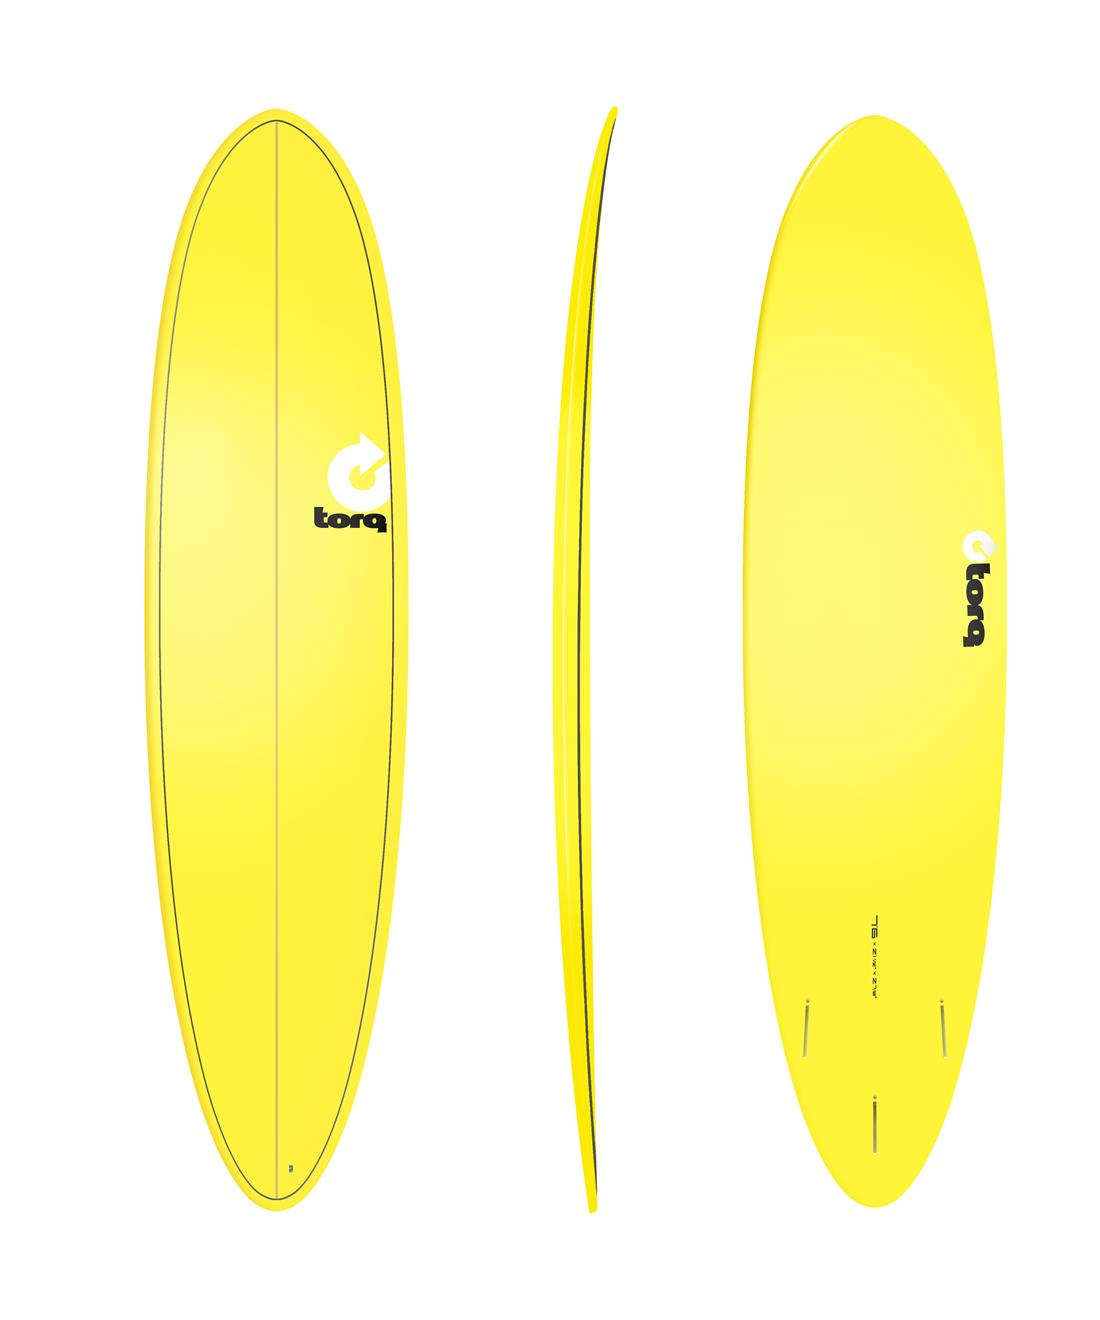 surfboard torq epoxy tet 7 6 funboard yellow wellenreiter surfbrett ebay. Black Bedroom Furniture Sets. Home Design Ideas